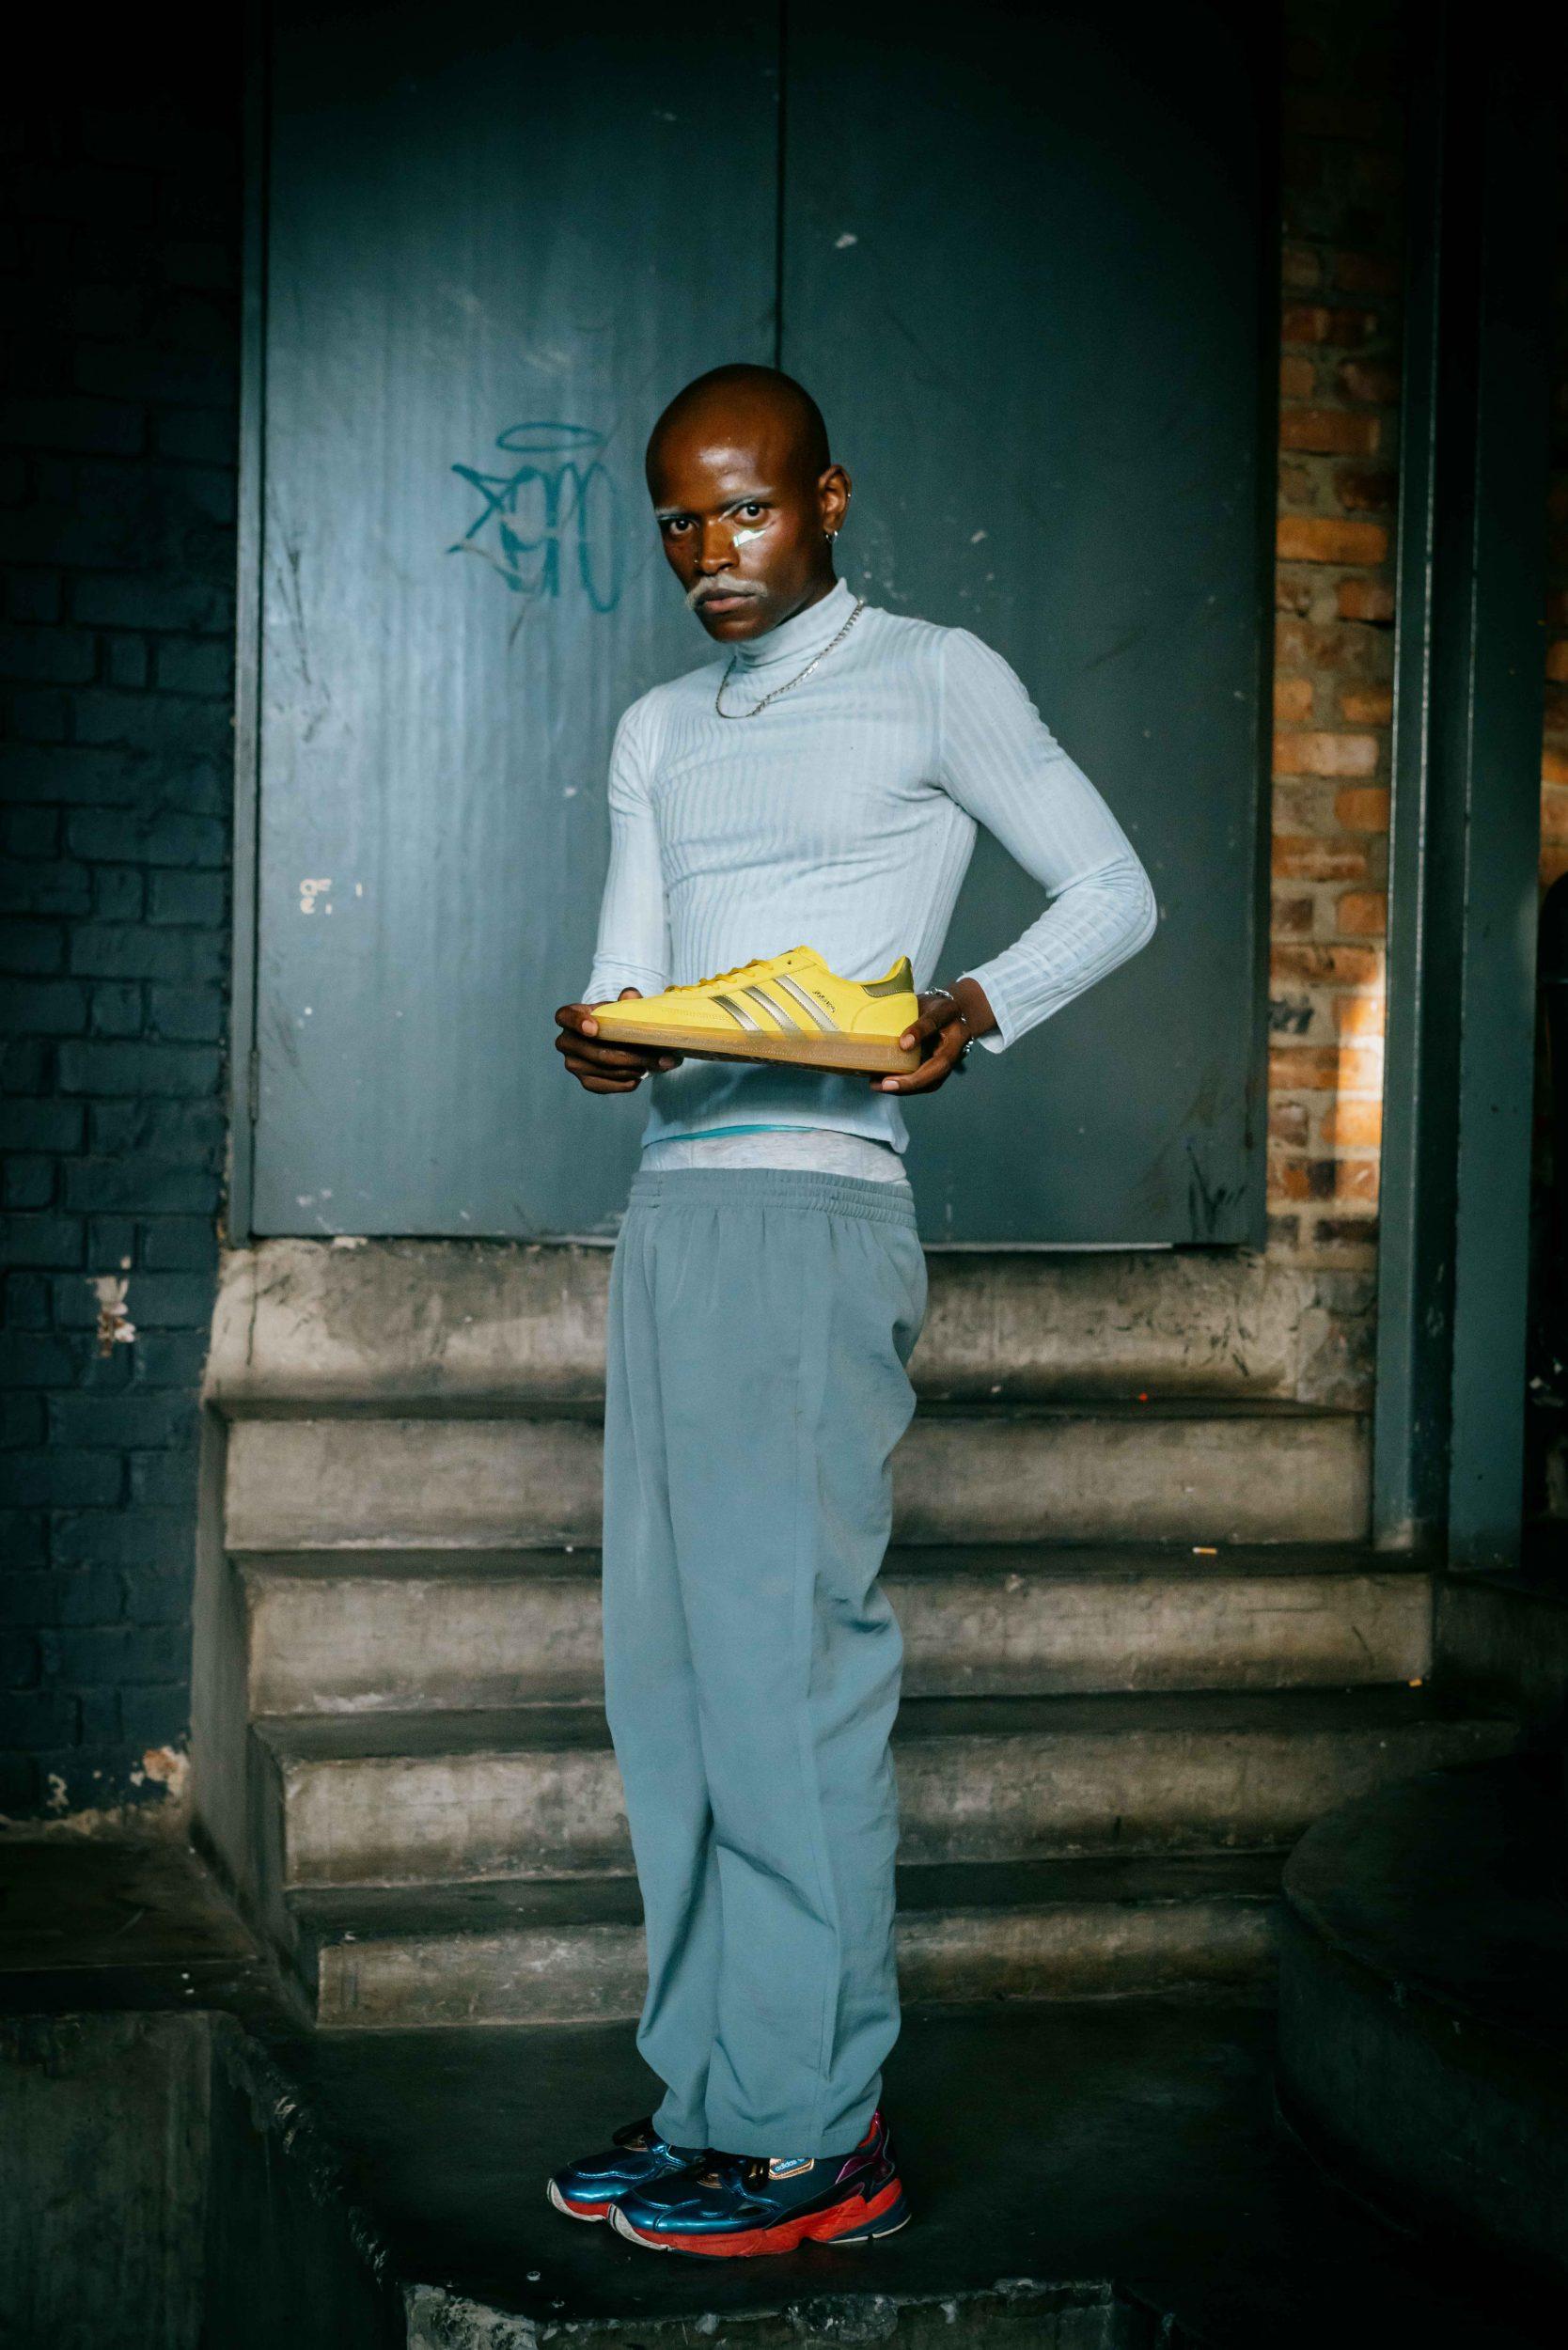 Adidas: Johannesburg Stills